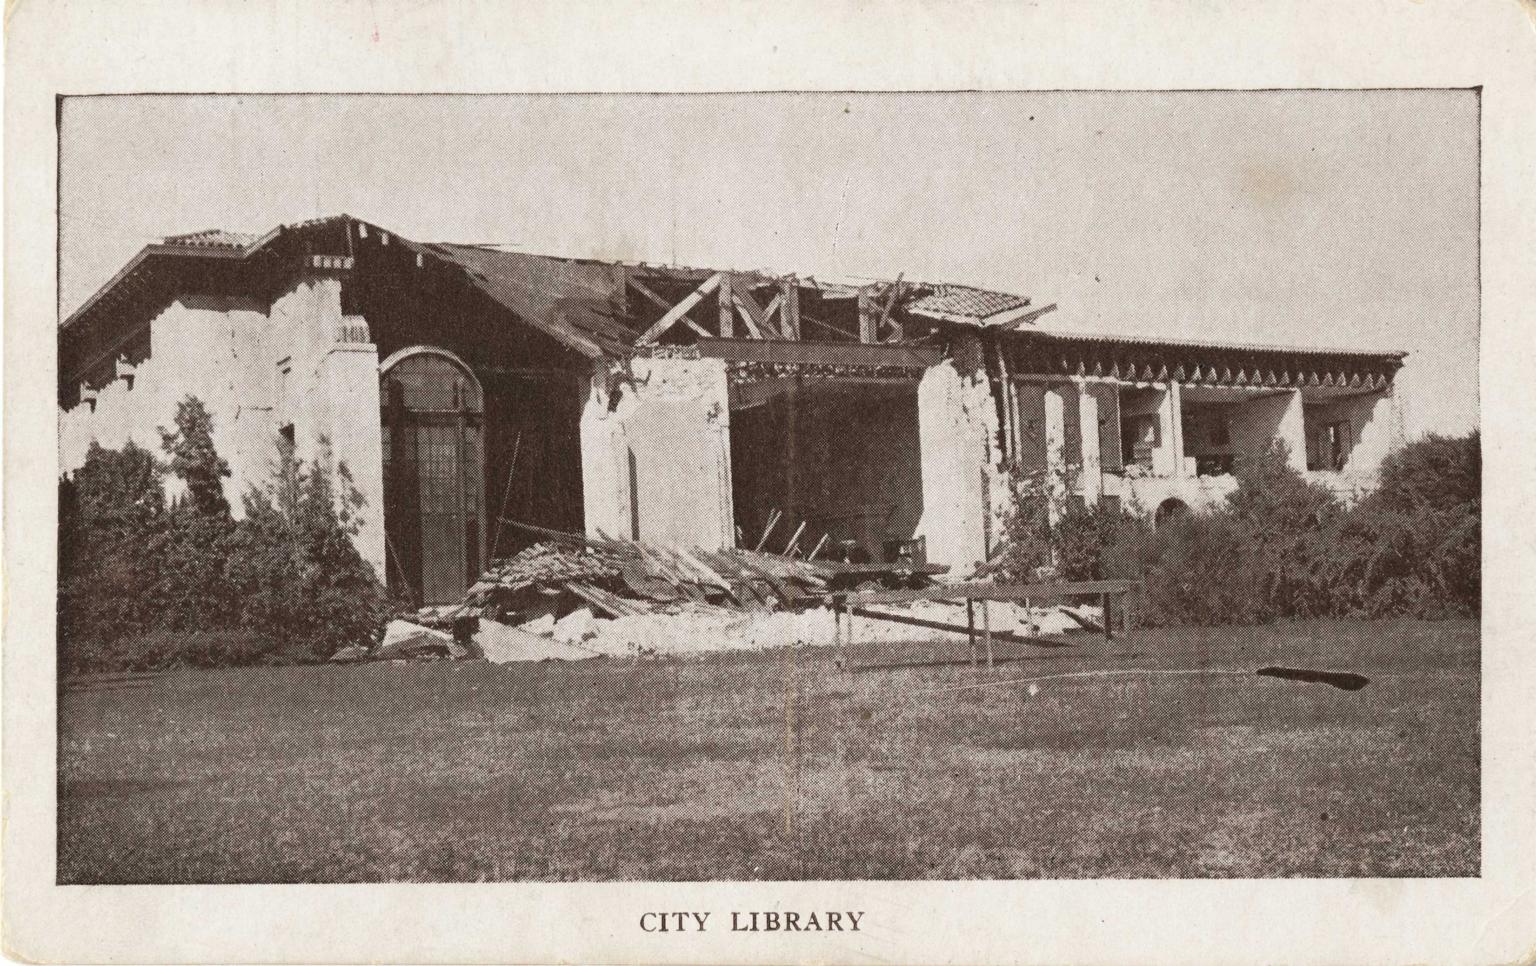 Santa Barbara 1925 Earthquake damage - City Library